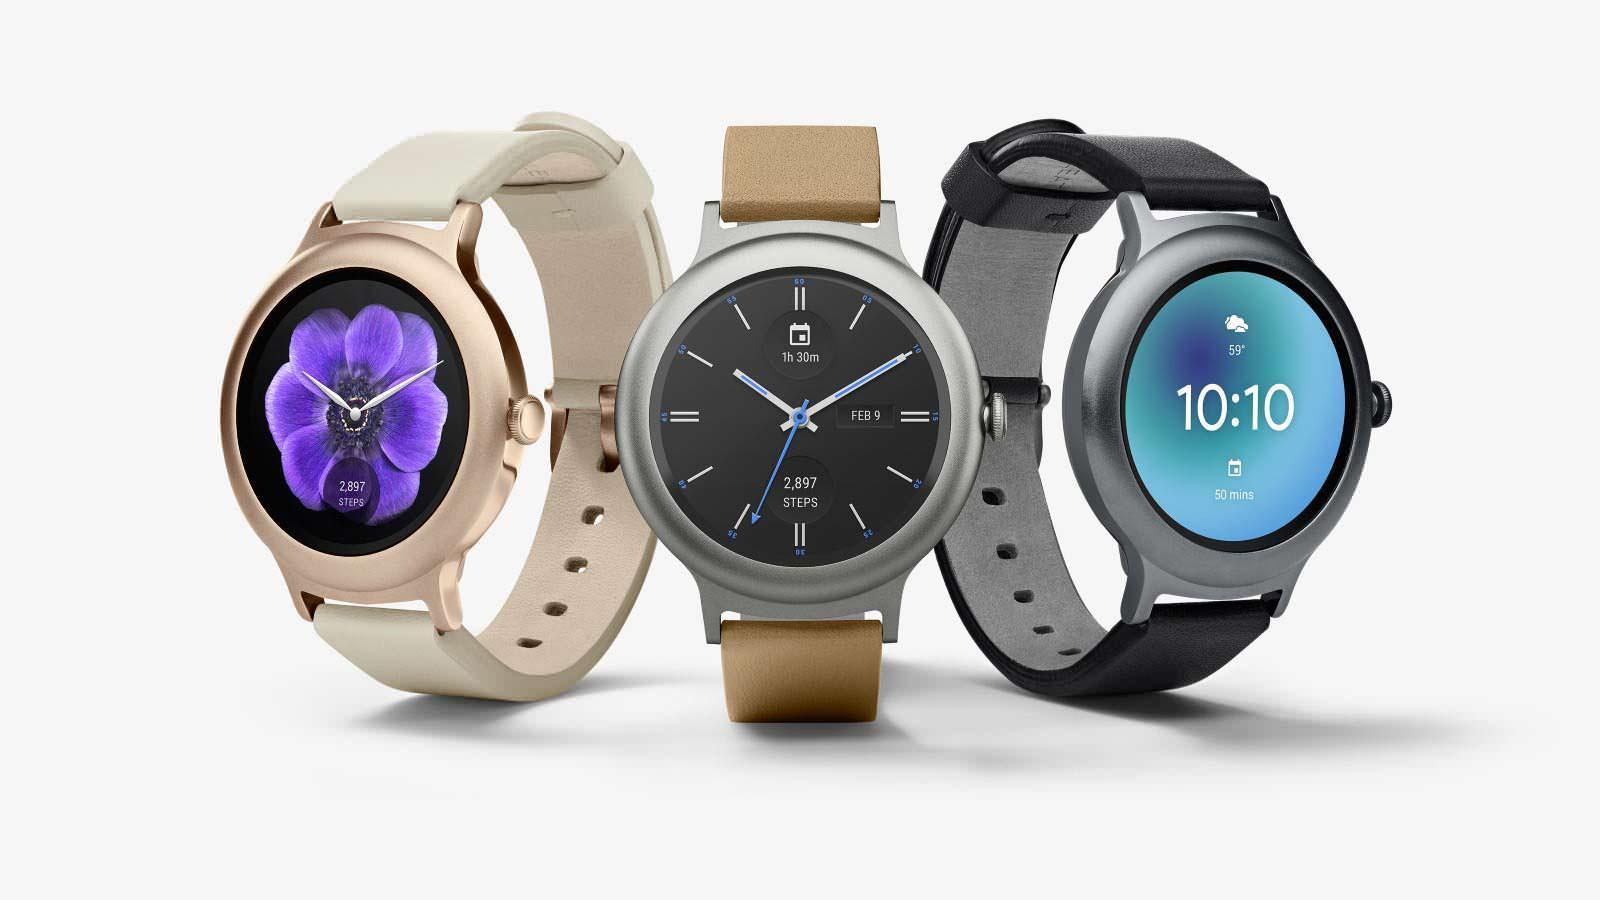 Цена LG Watch Style равна $249